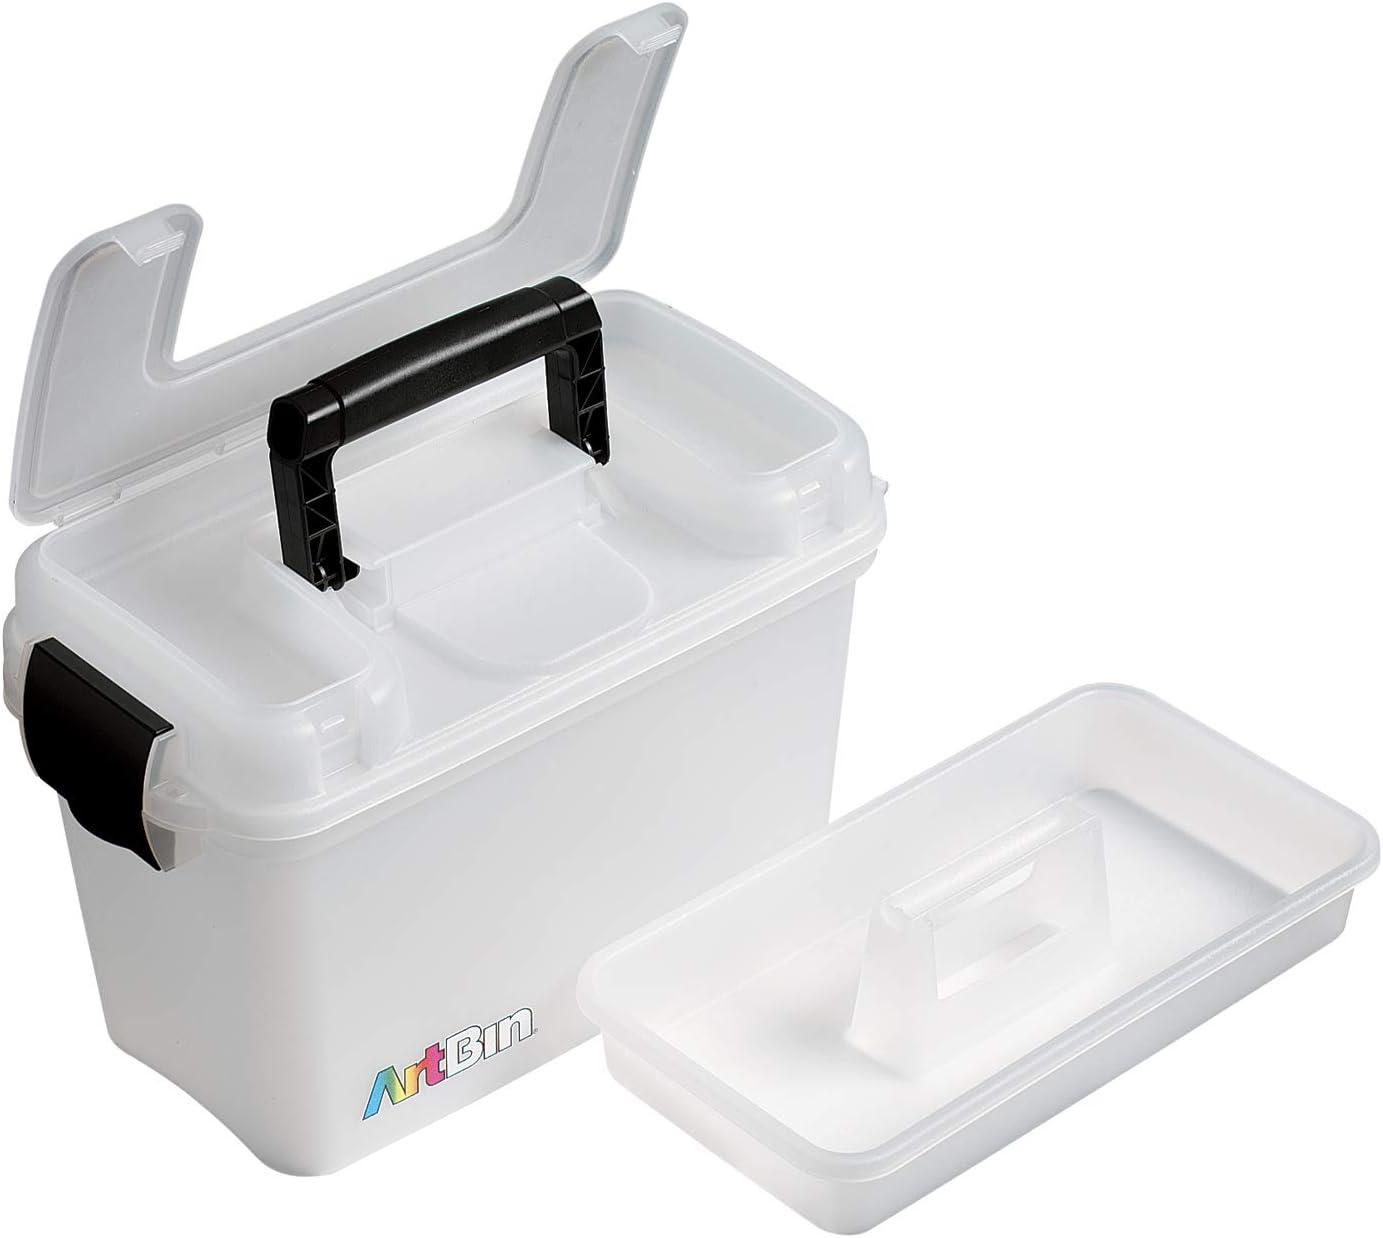 Small Plastic Storage Box Multipurpose Organizer Carry Case Container White new